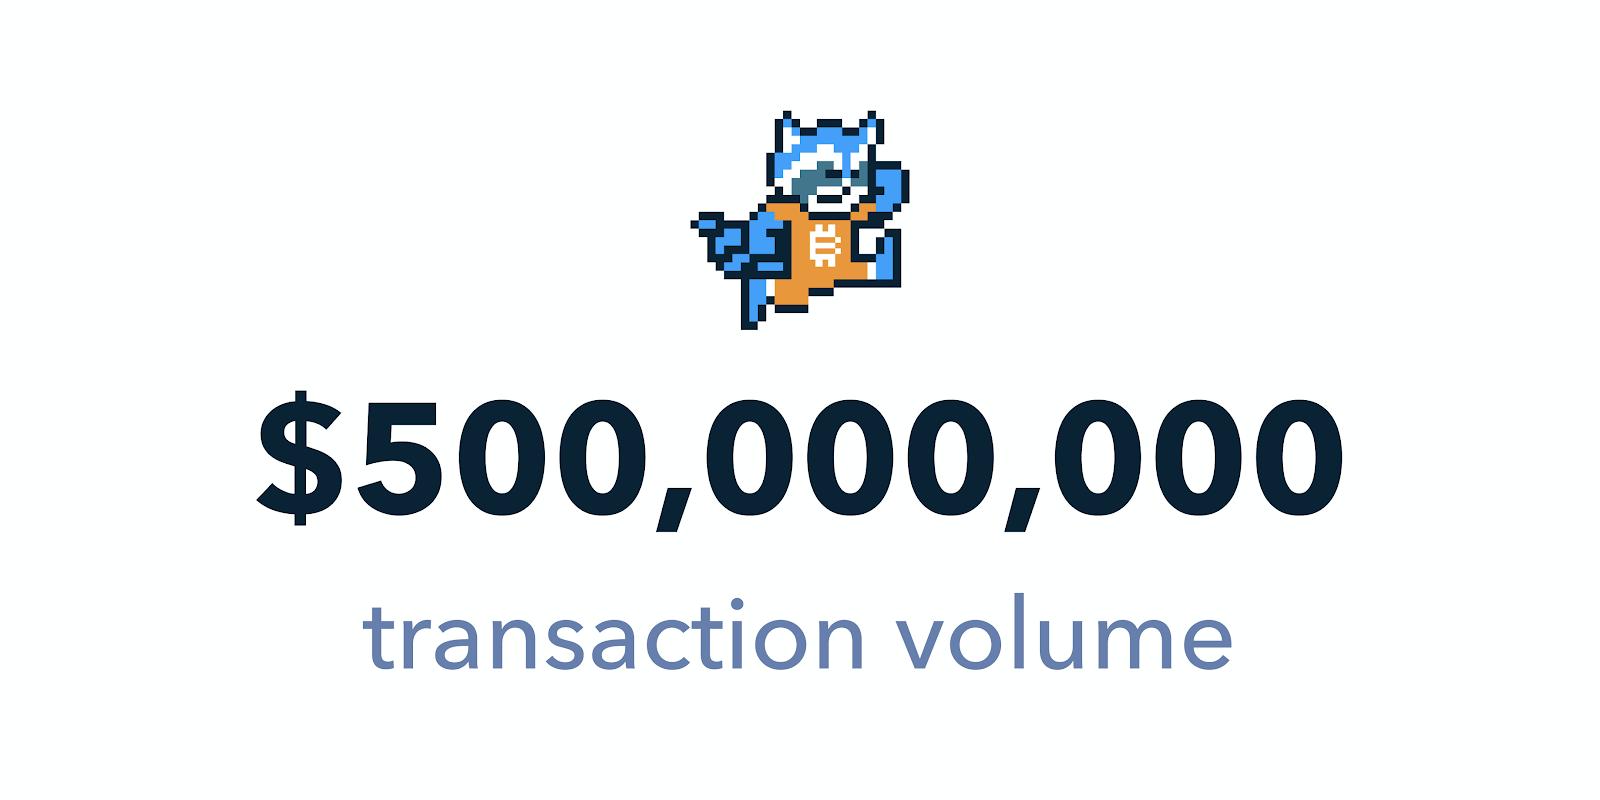 $500,000,000 transaction volume, and an image of Shakepay's mascot, Shakey